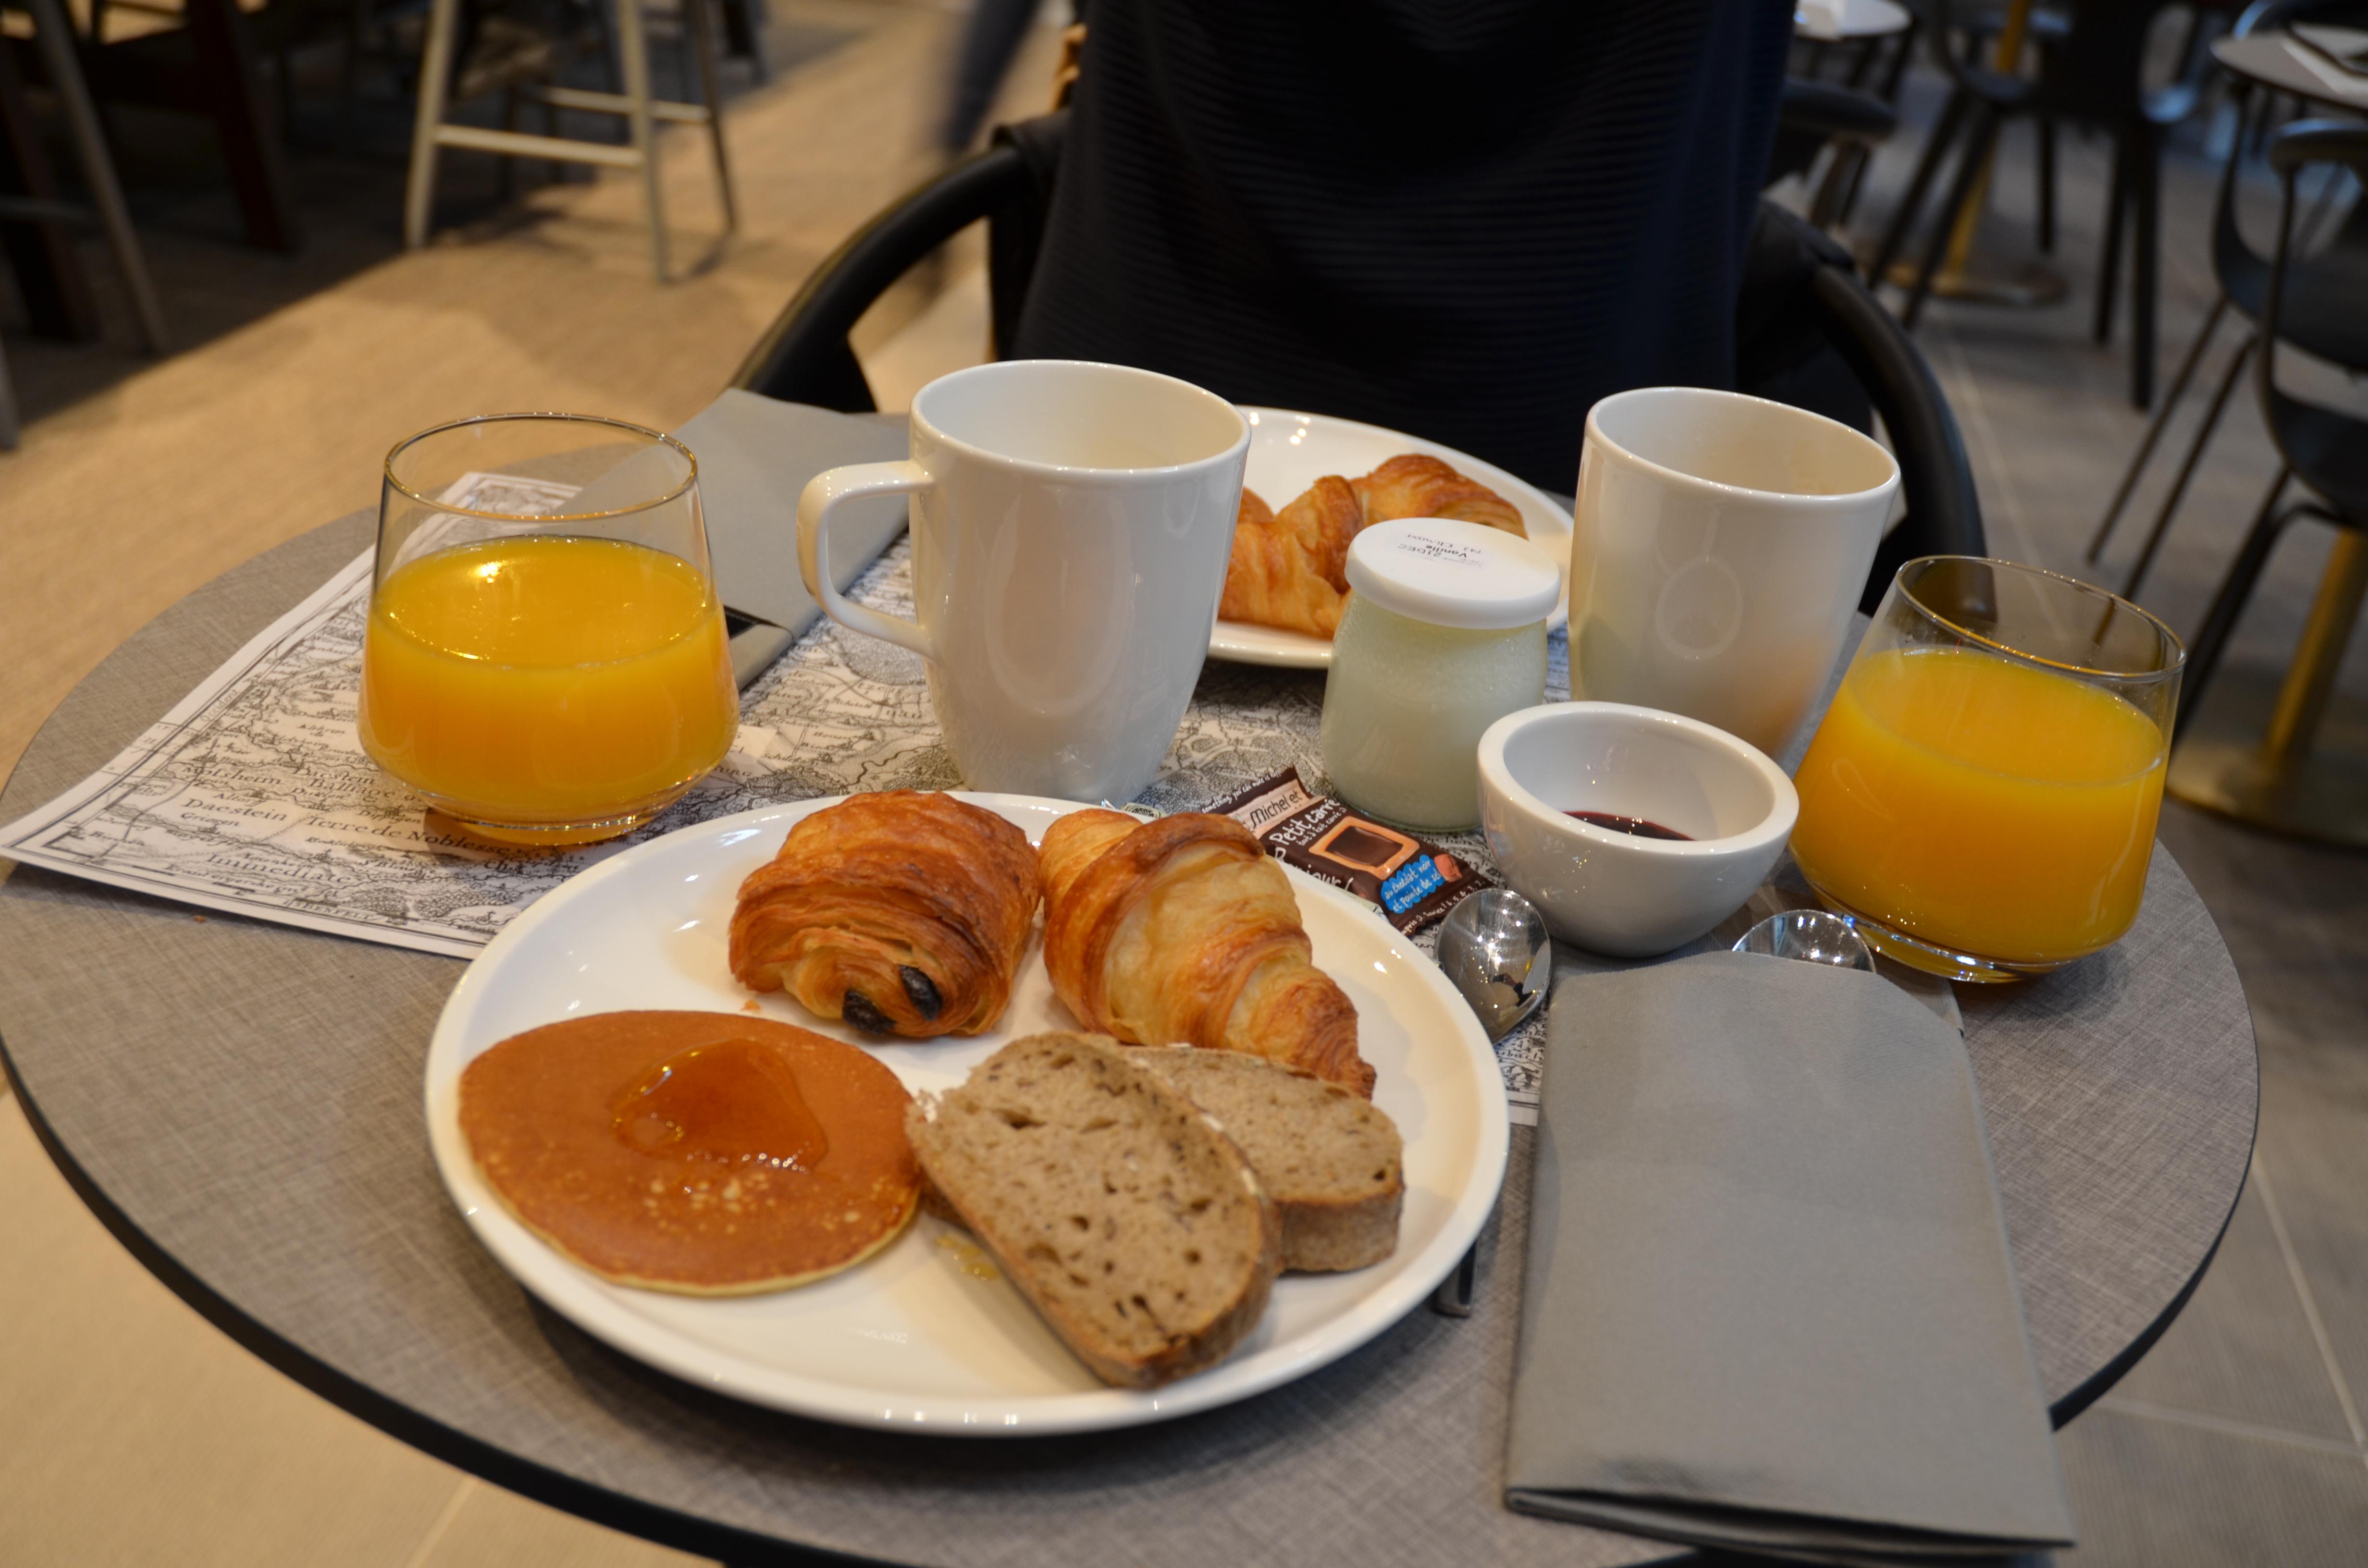 blog-mode-beaute-lifestyle-deco-voyage-cuisine-strasbourg